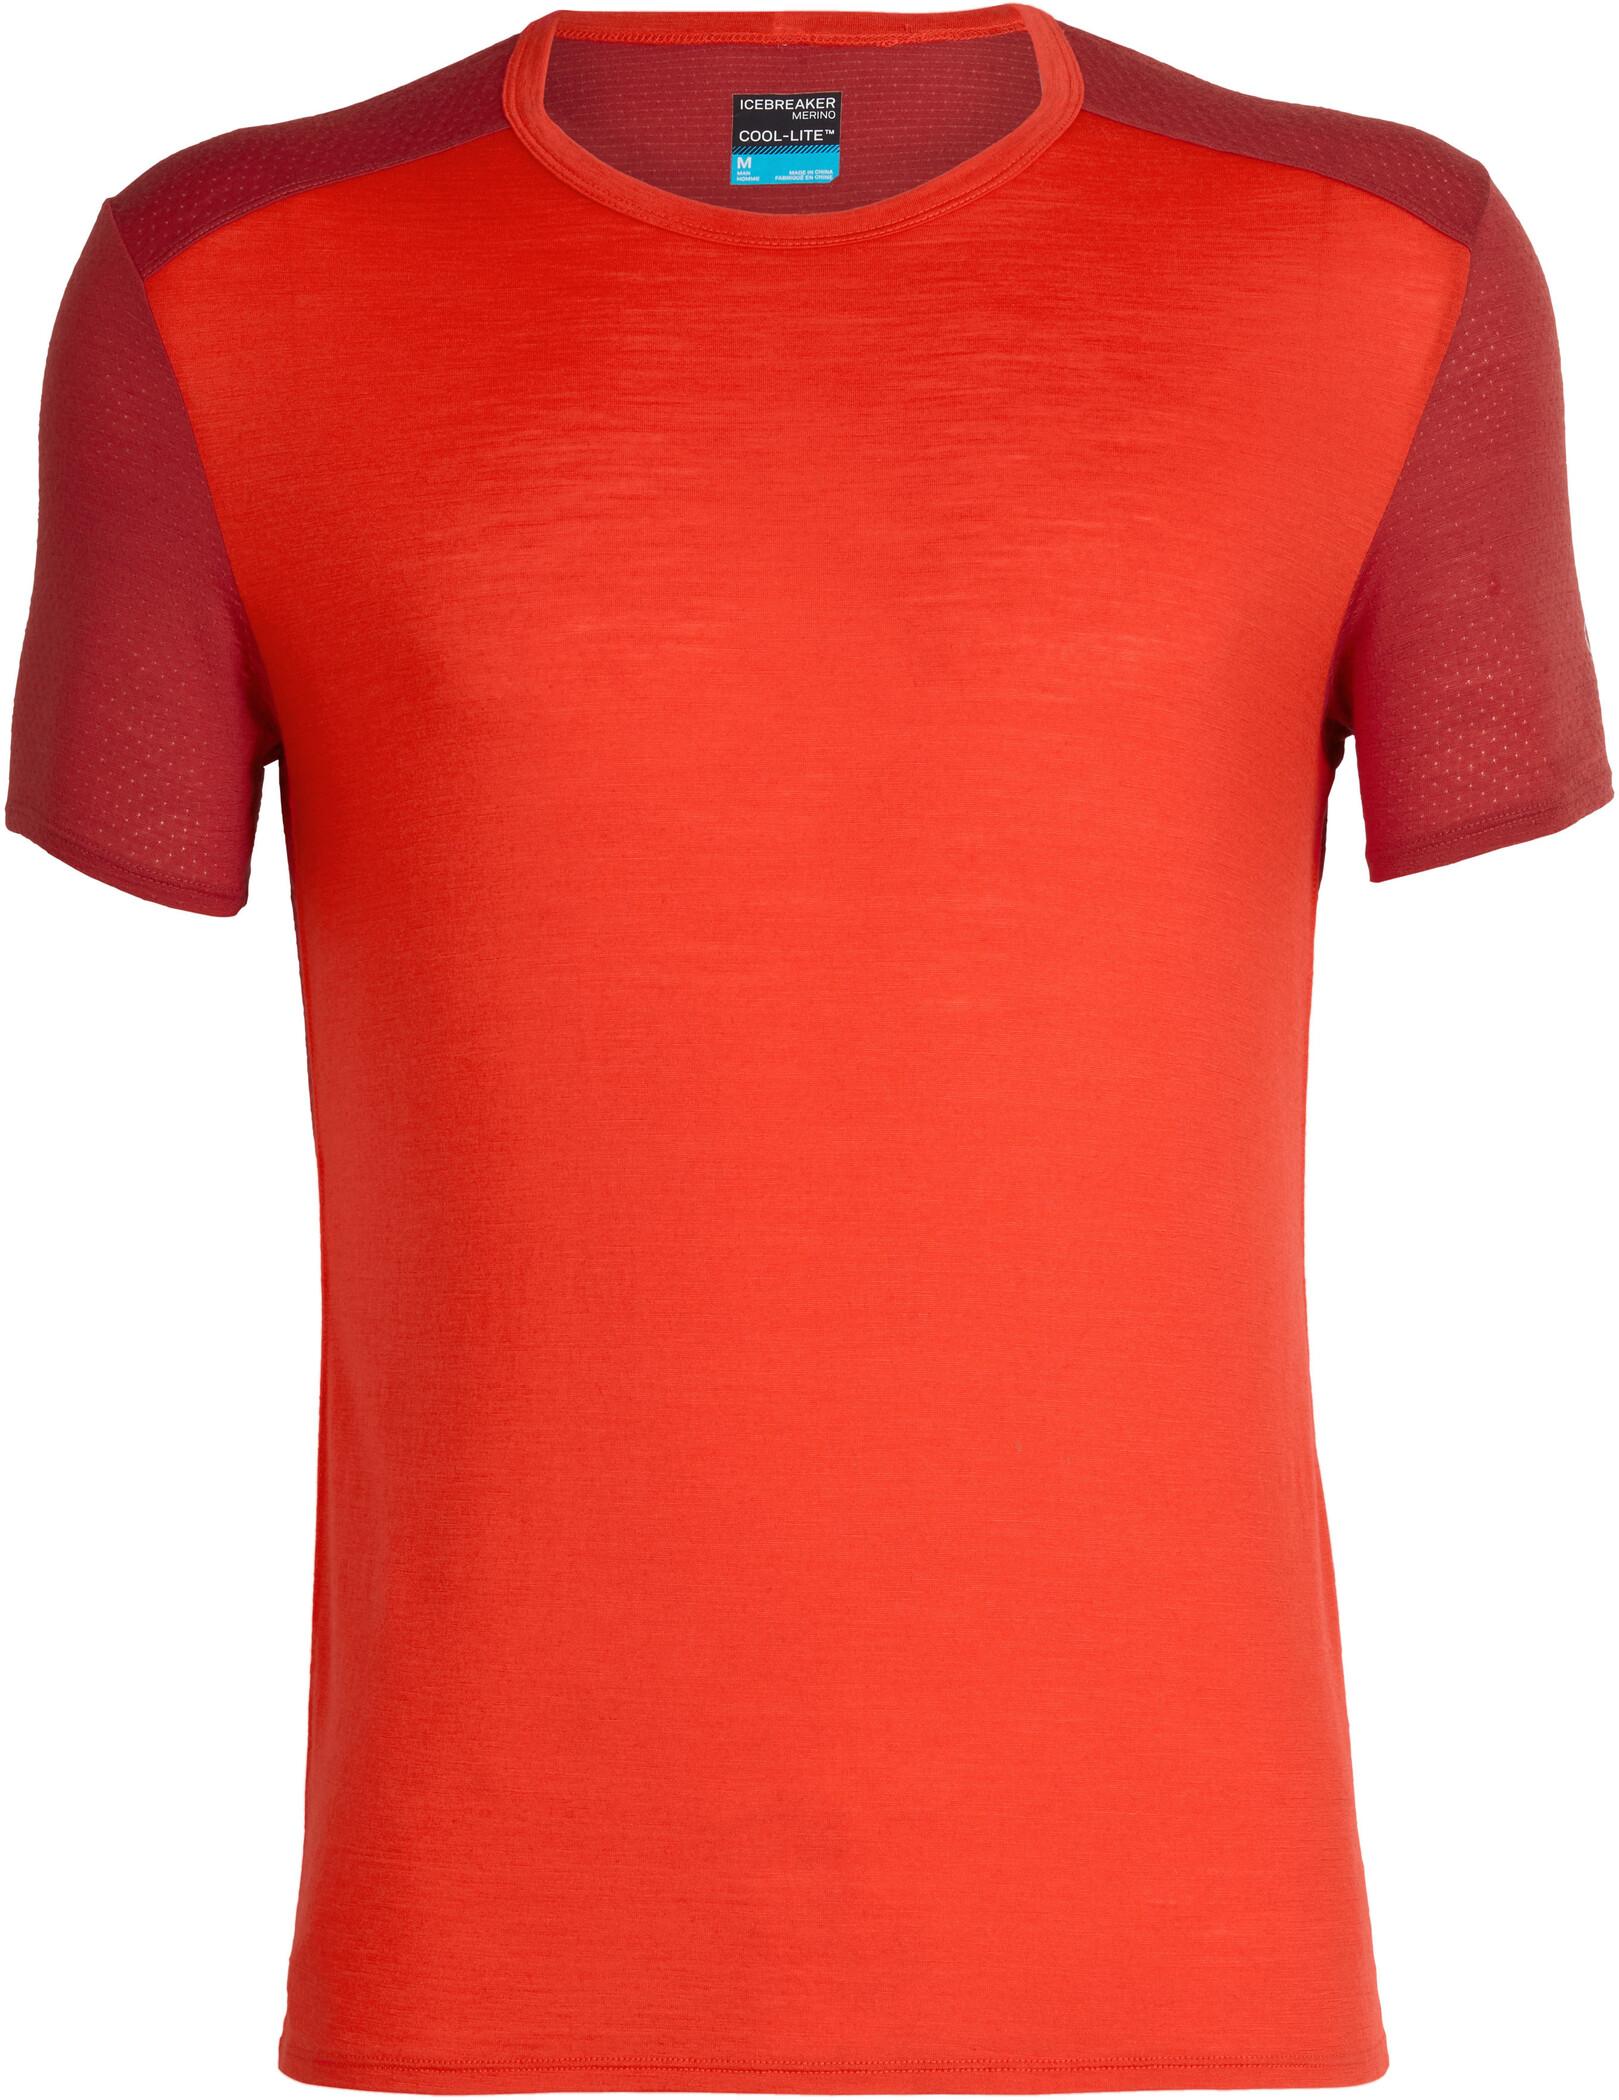 Icebreaker Amplify T-shirt Herrer, chili red/sienna (2019) | Jerseys